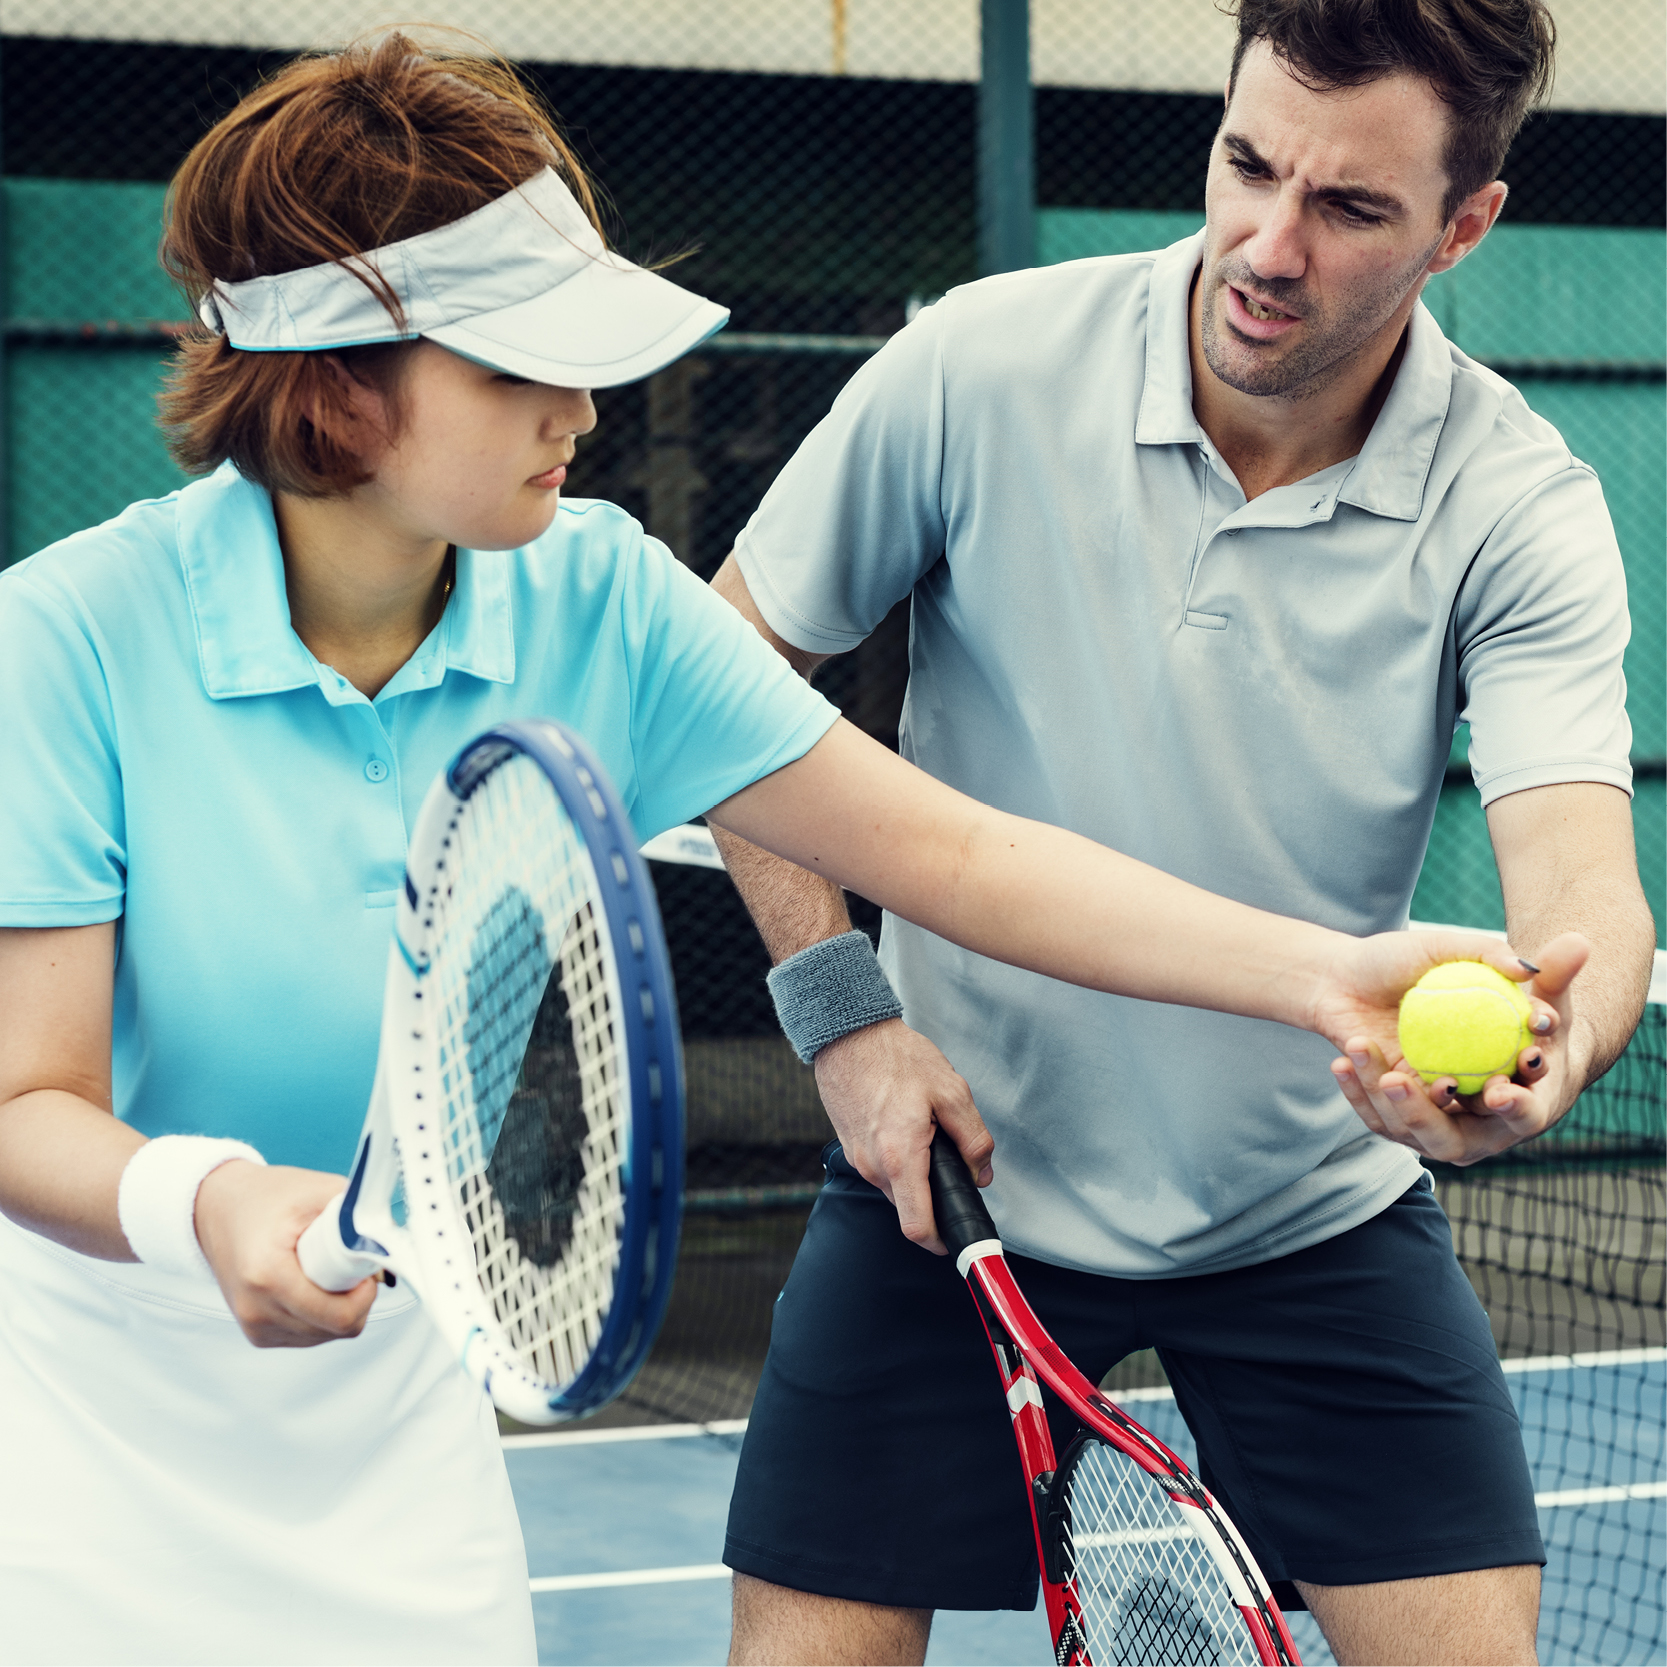 Beginners Tennis